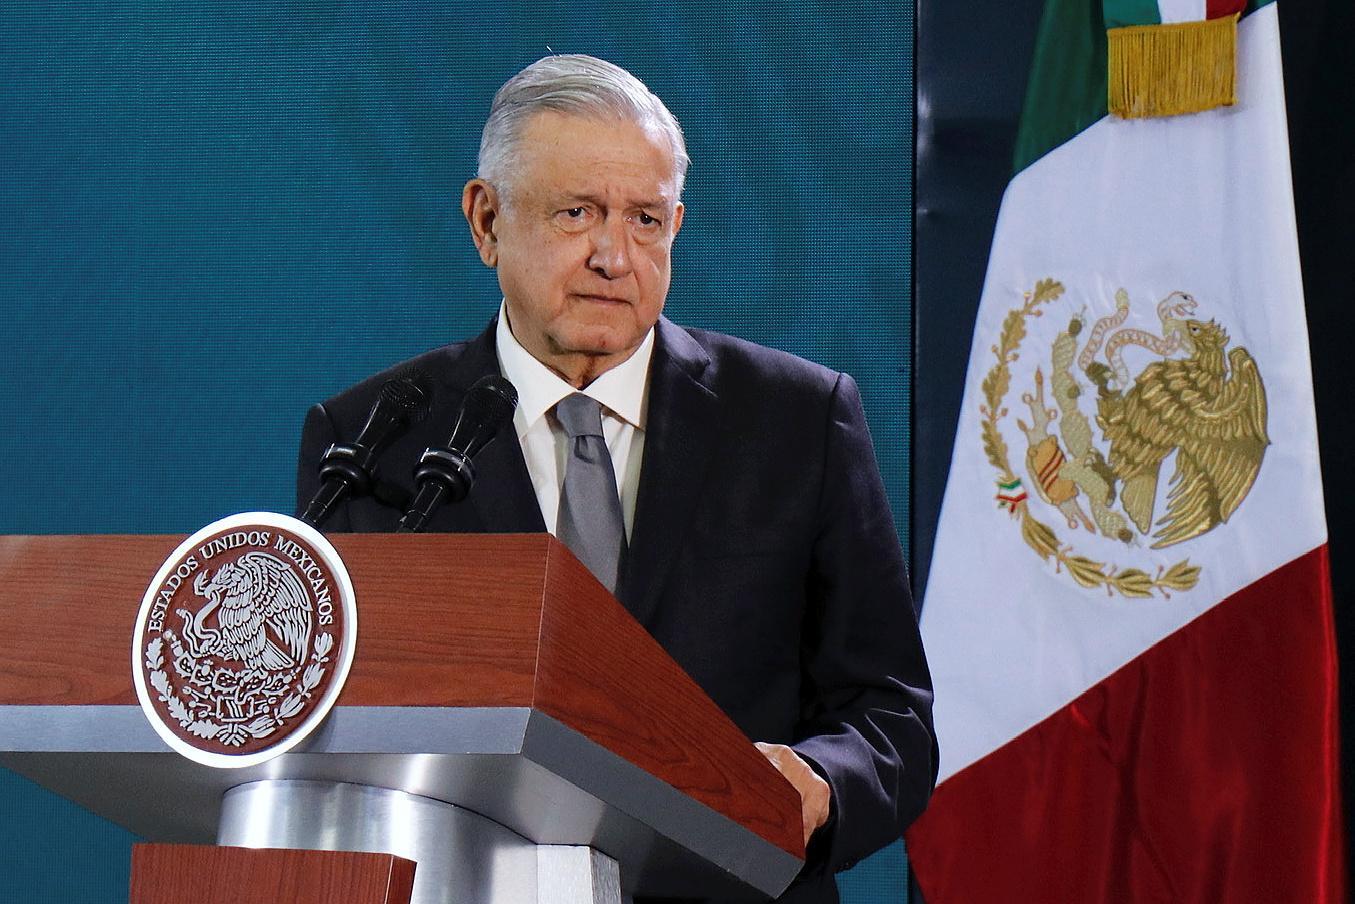 Mexican president hails decision to release Guzman son; critics...